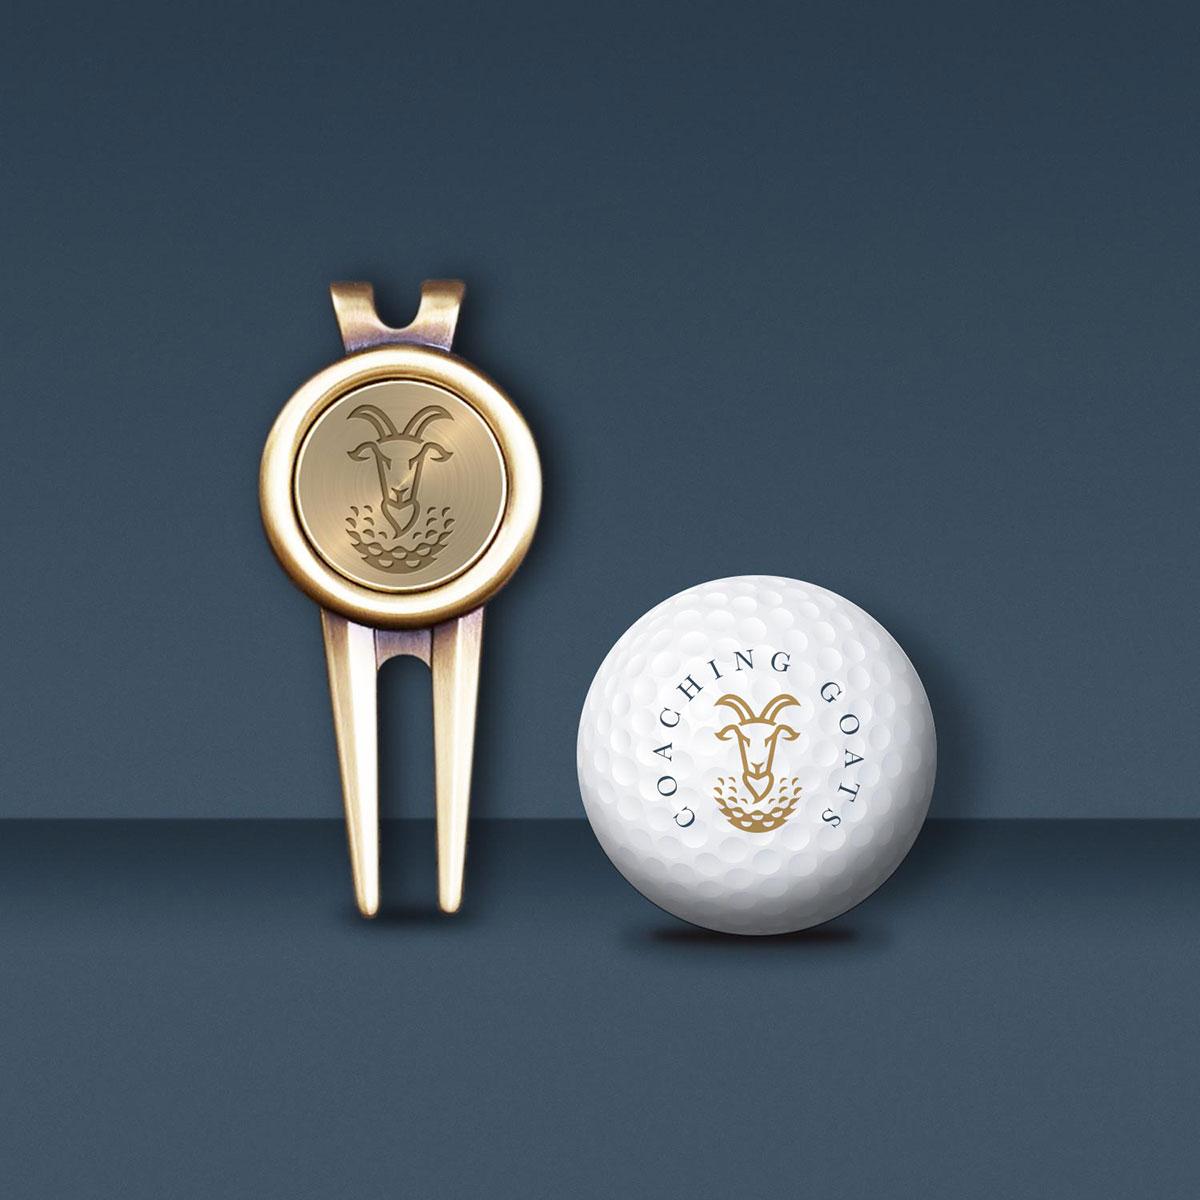 goat golf divot design